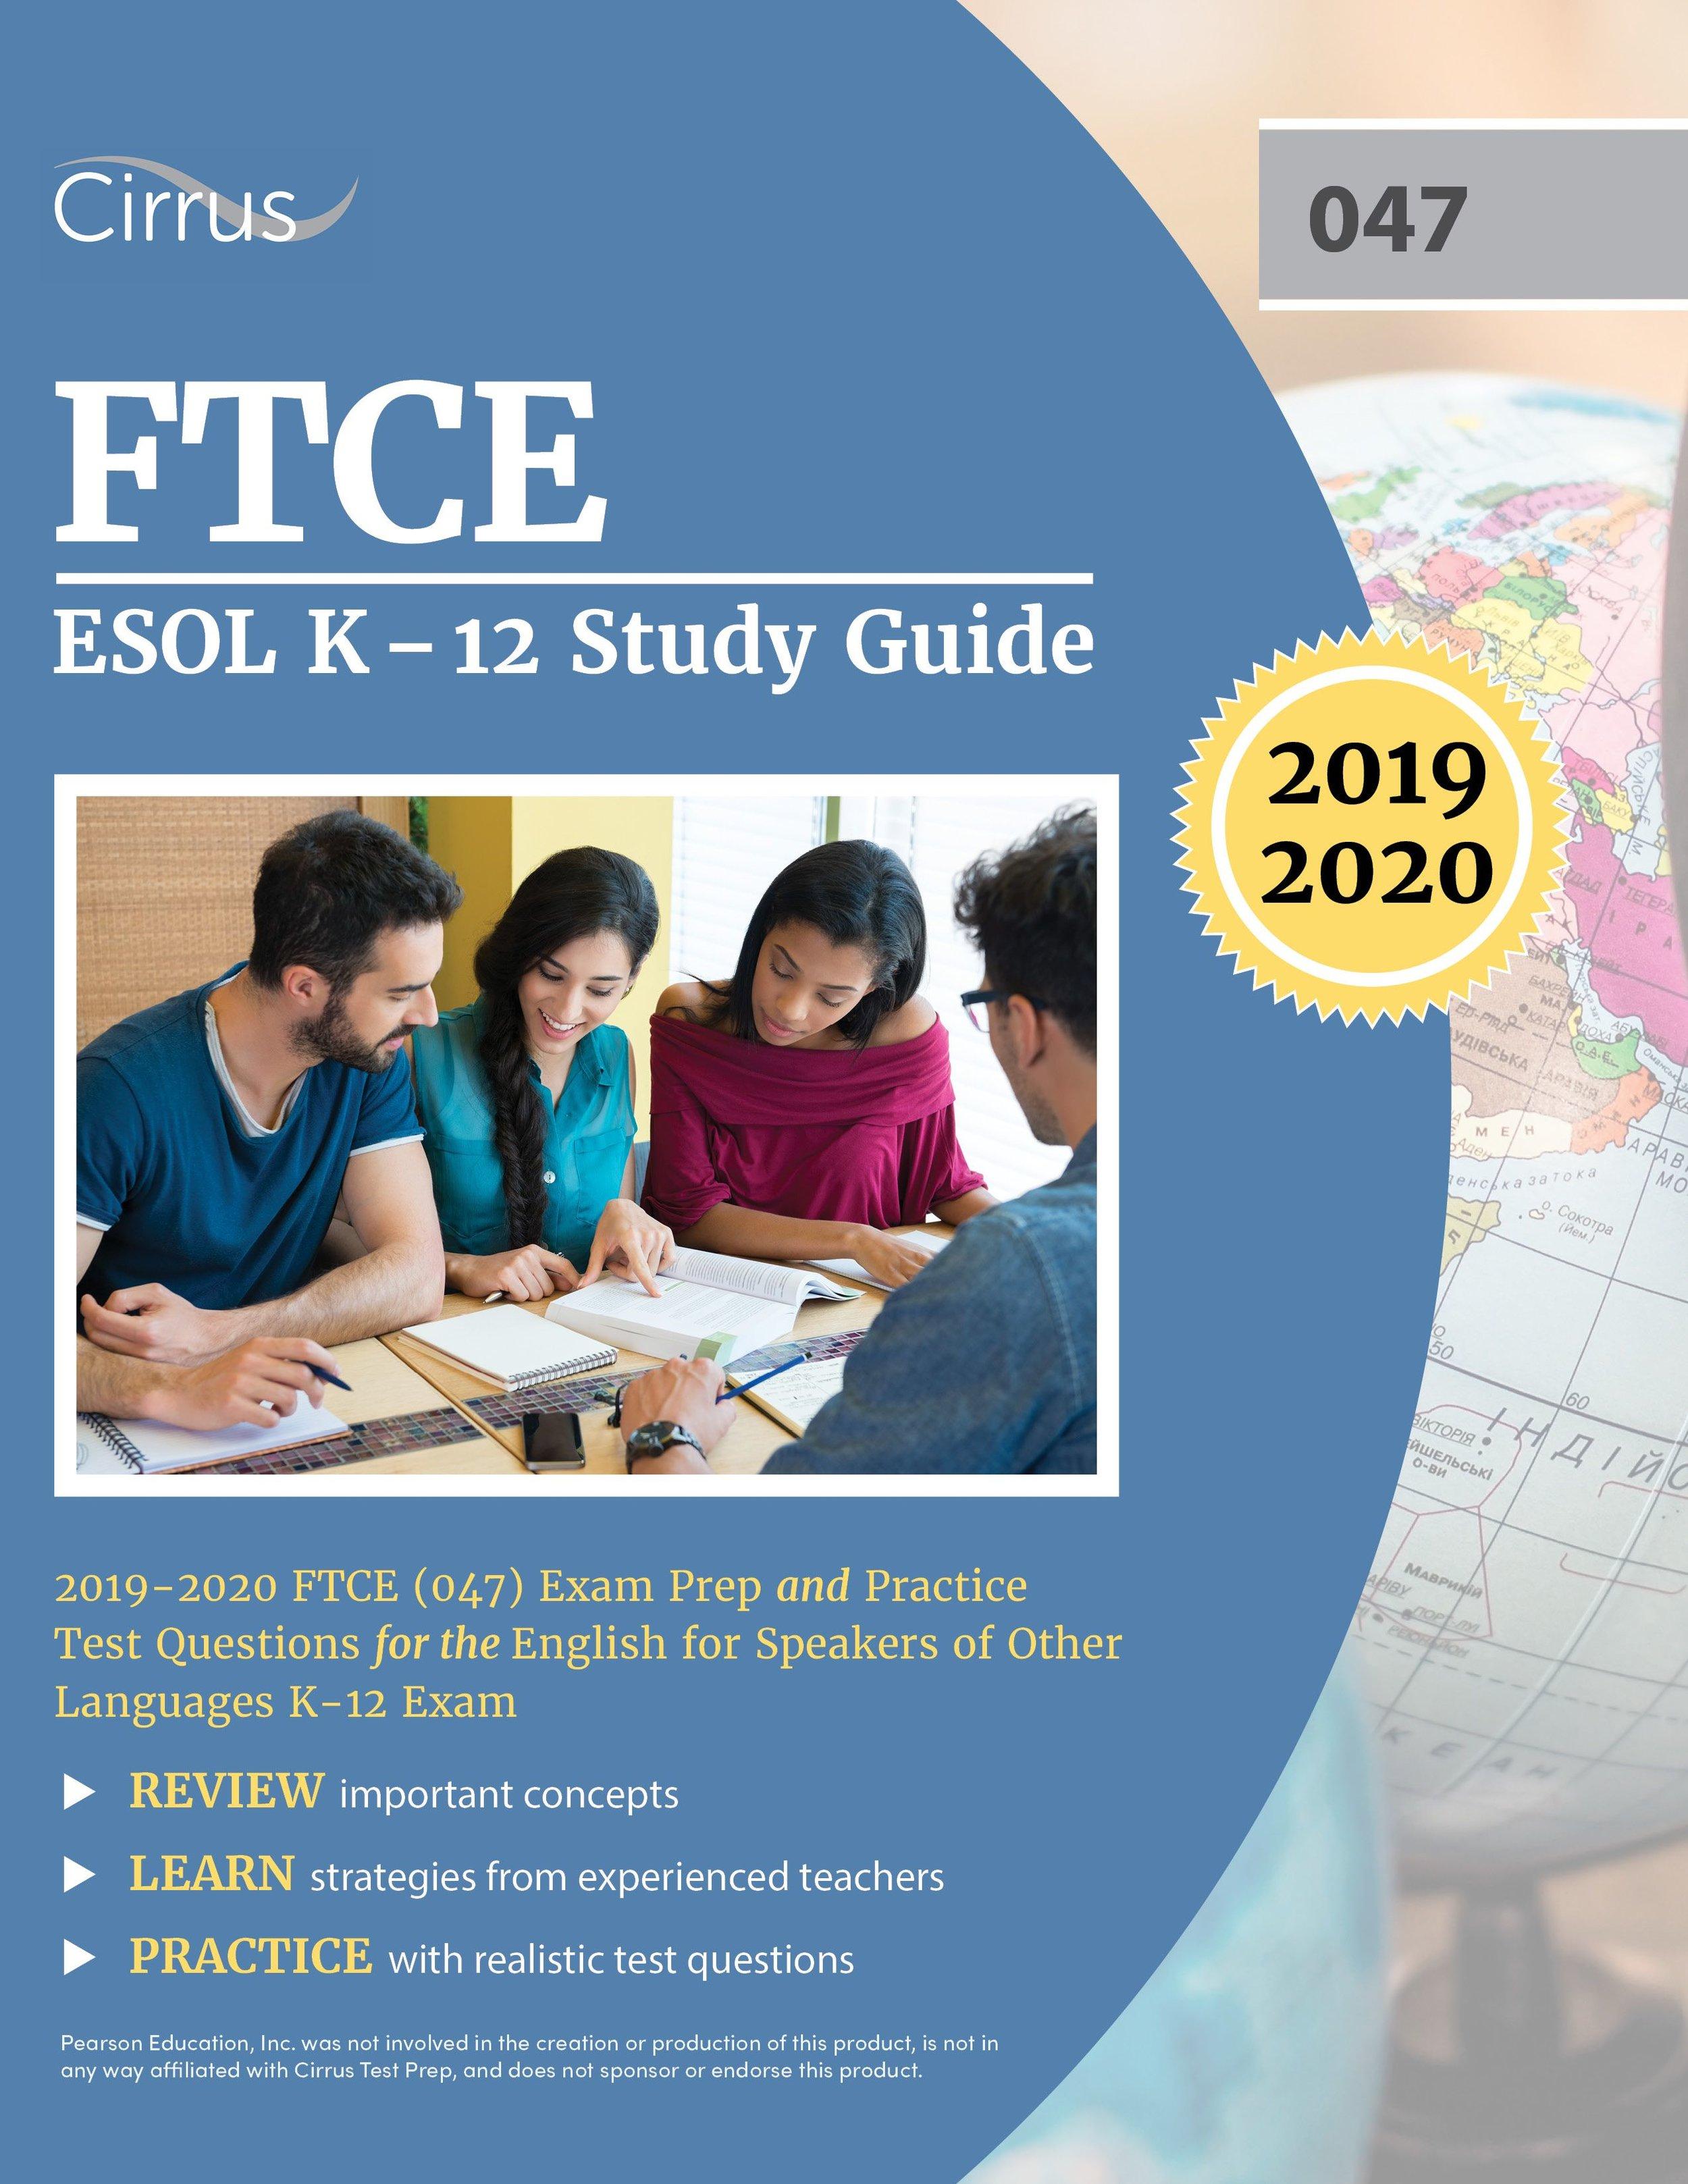 FTCE_cover_website-compressor.jpg